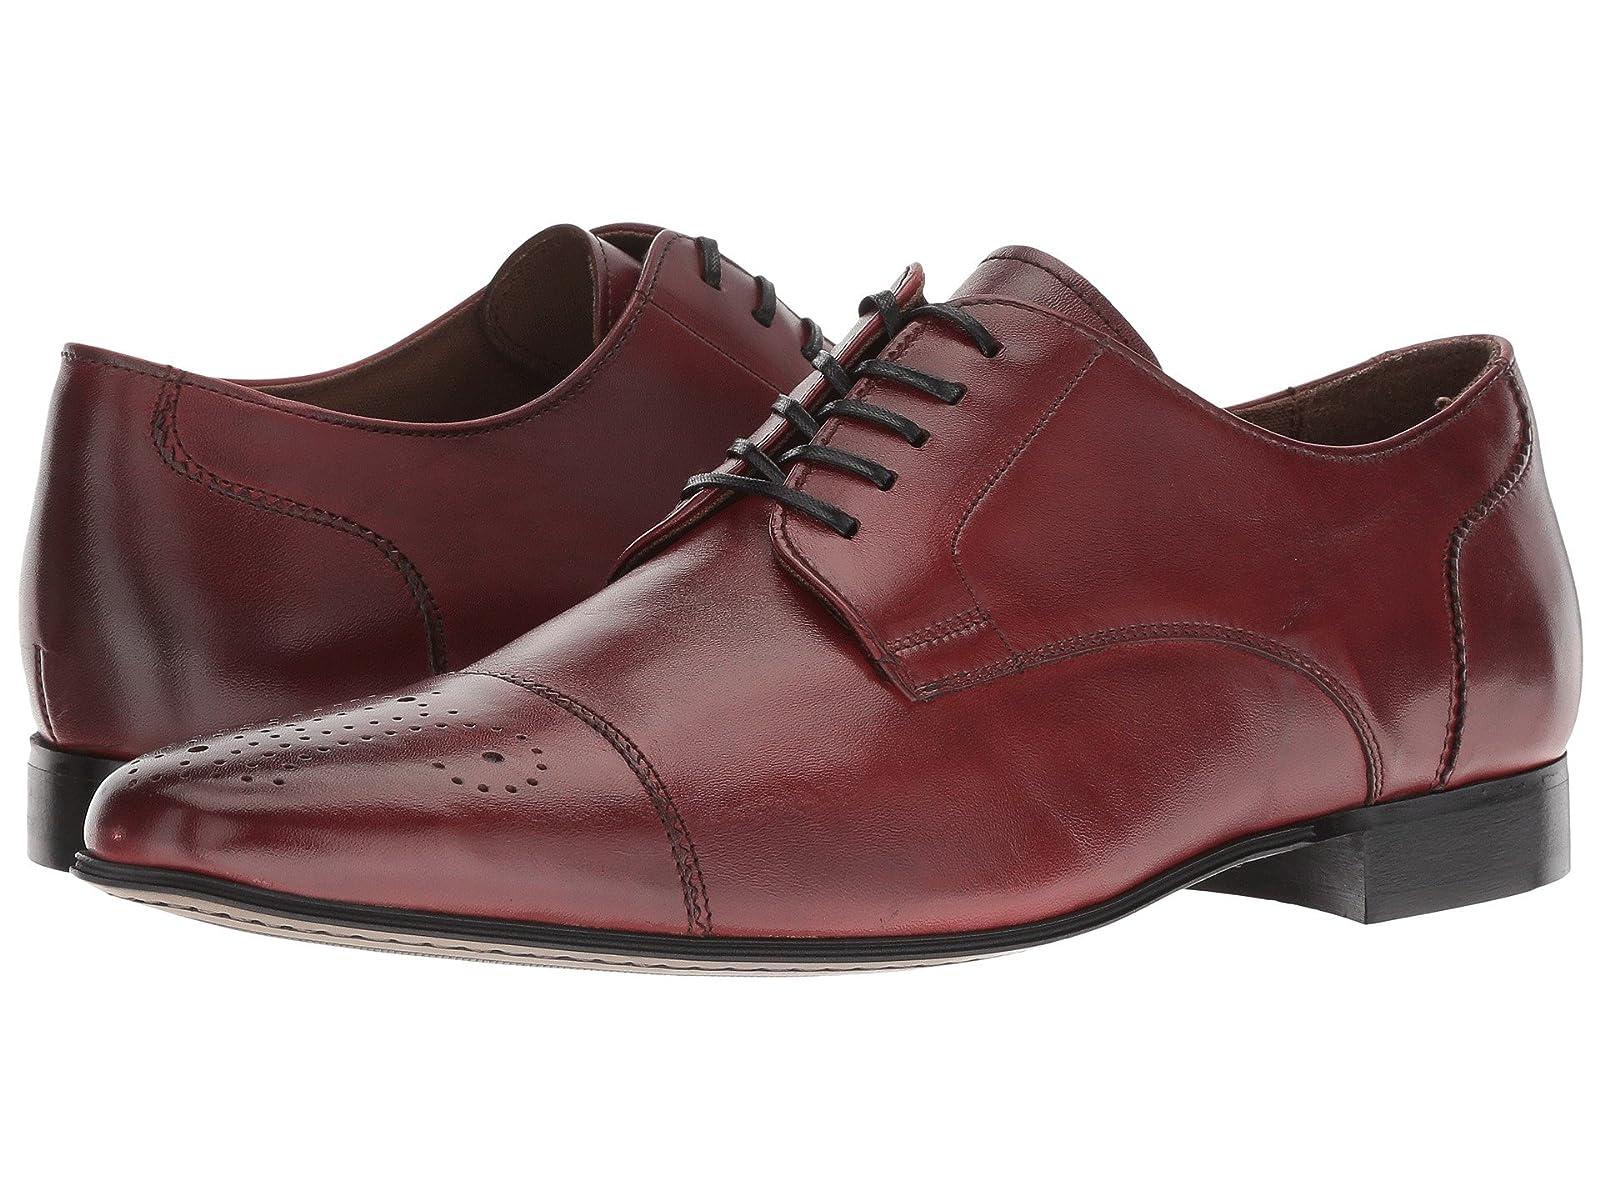 ALDO RecisoAtmospheric grades have affordable shoes